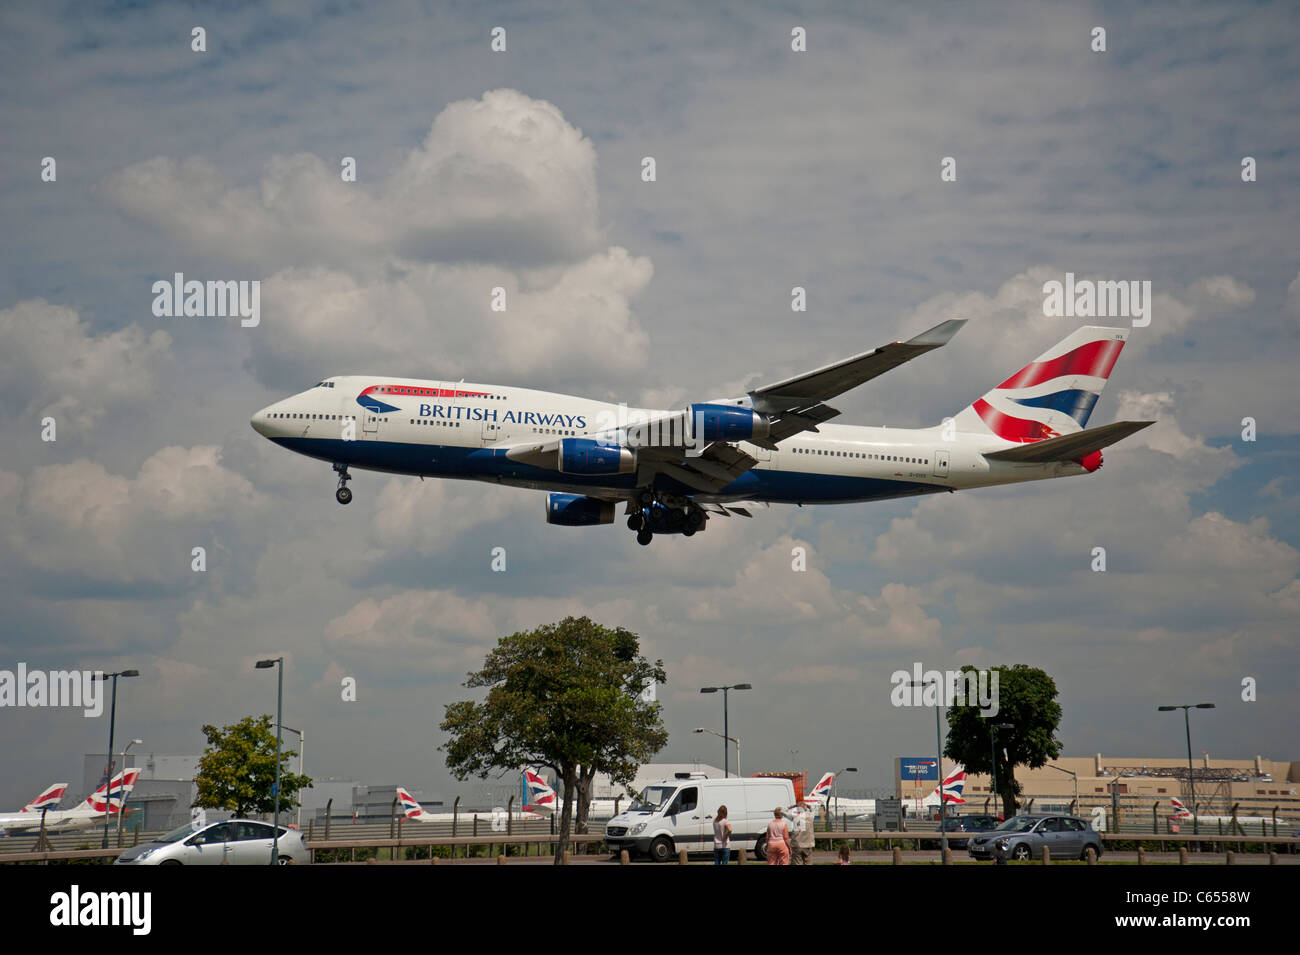 British Airways Boeing 747-436 Jet Airliner.  SCO 7580. - Stock Image